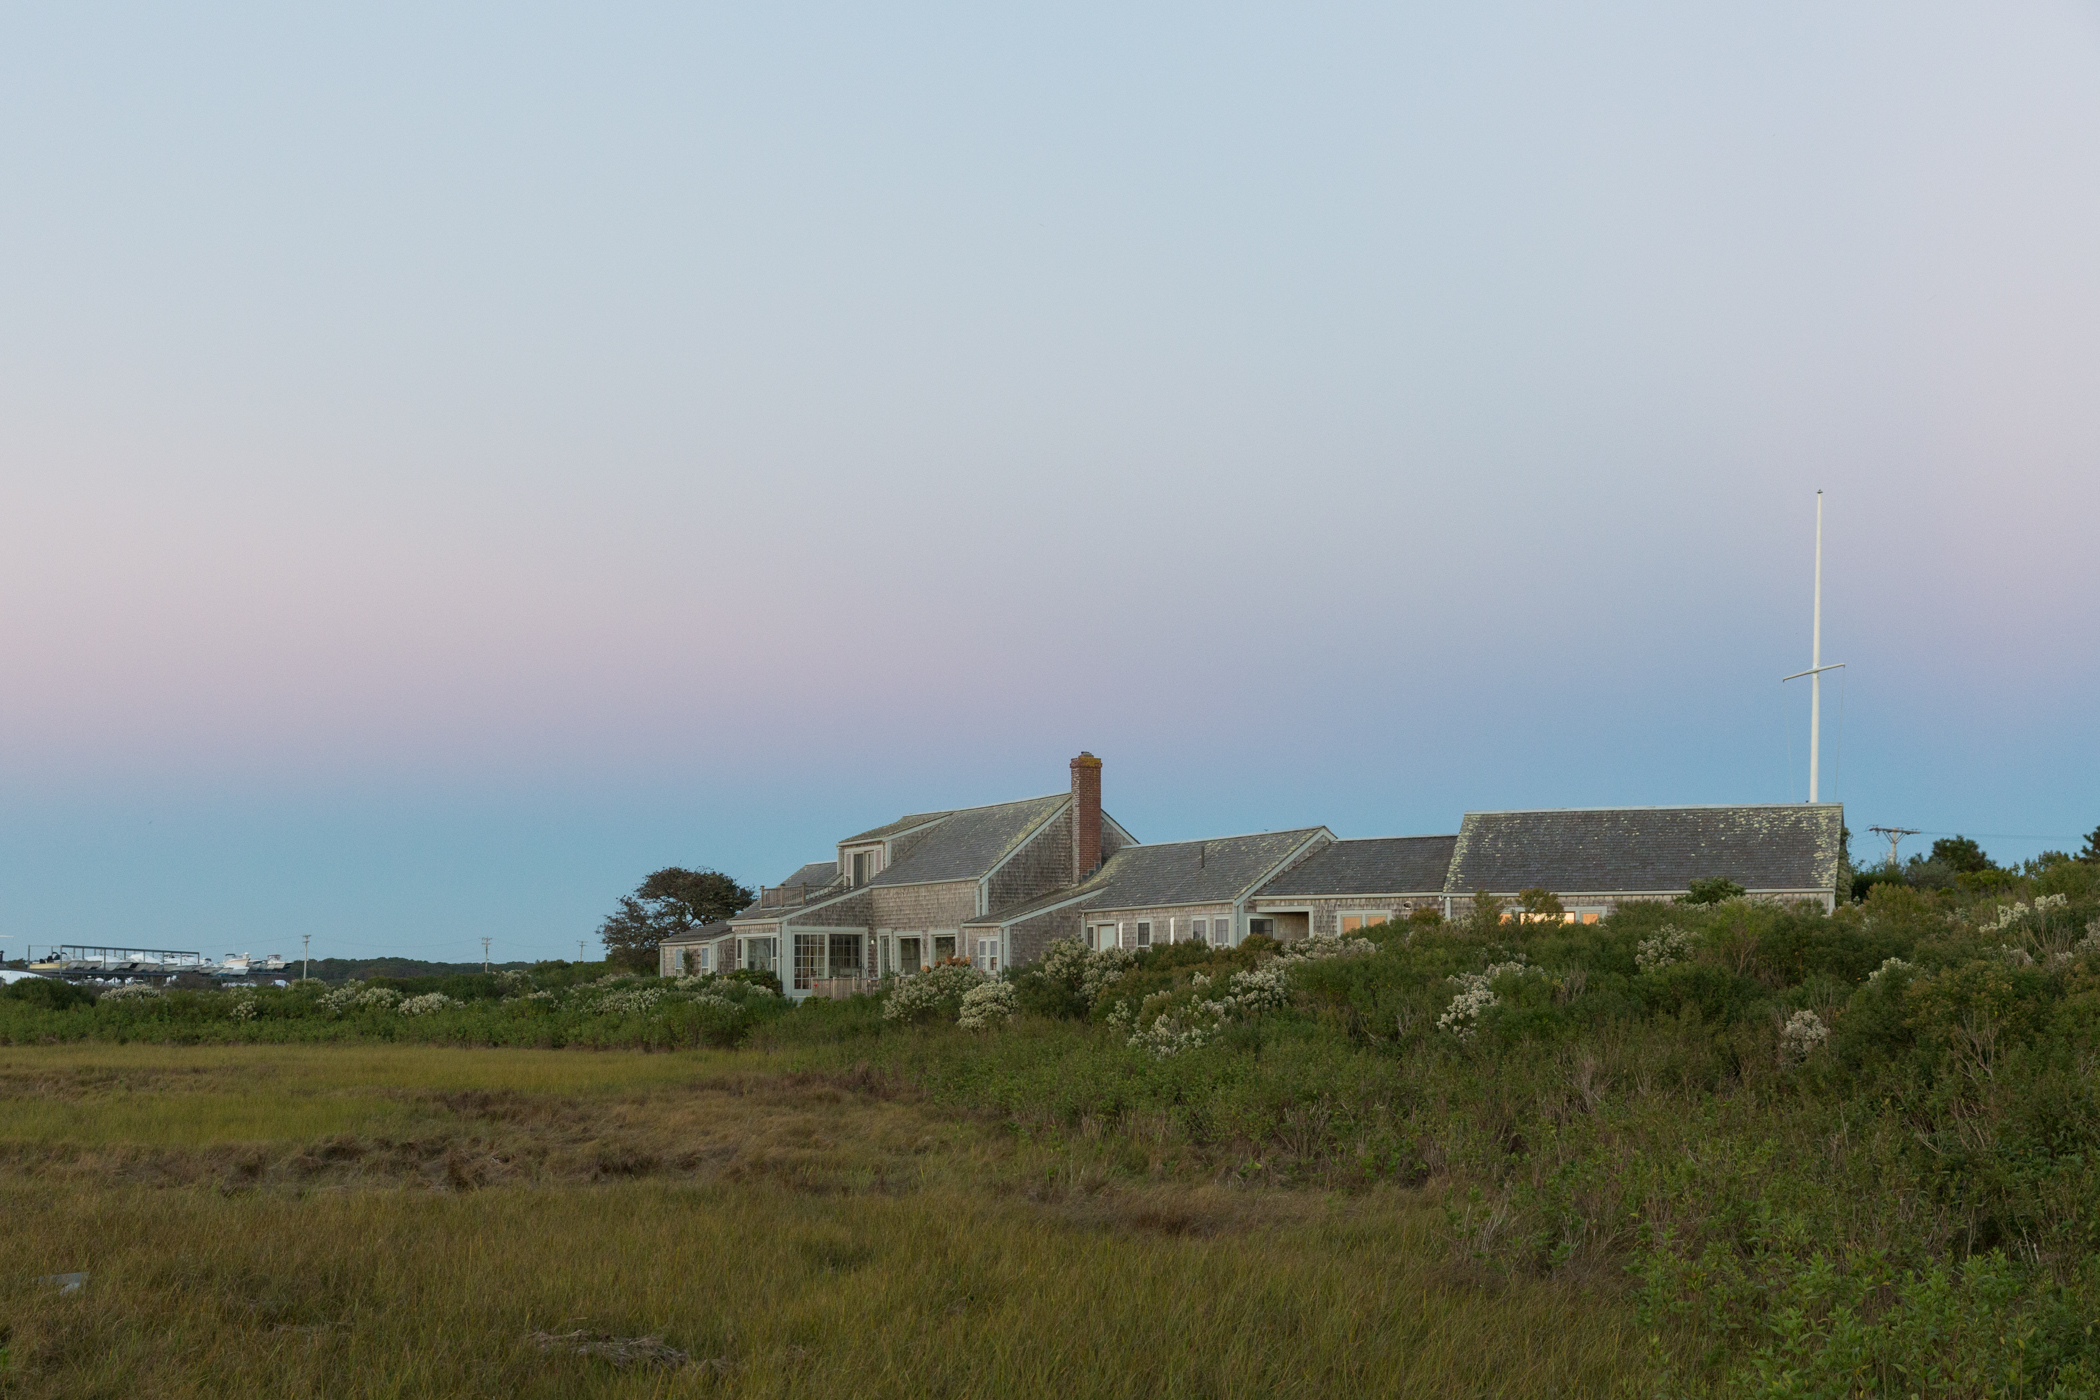 1610-Nantucket-580.jpg